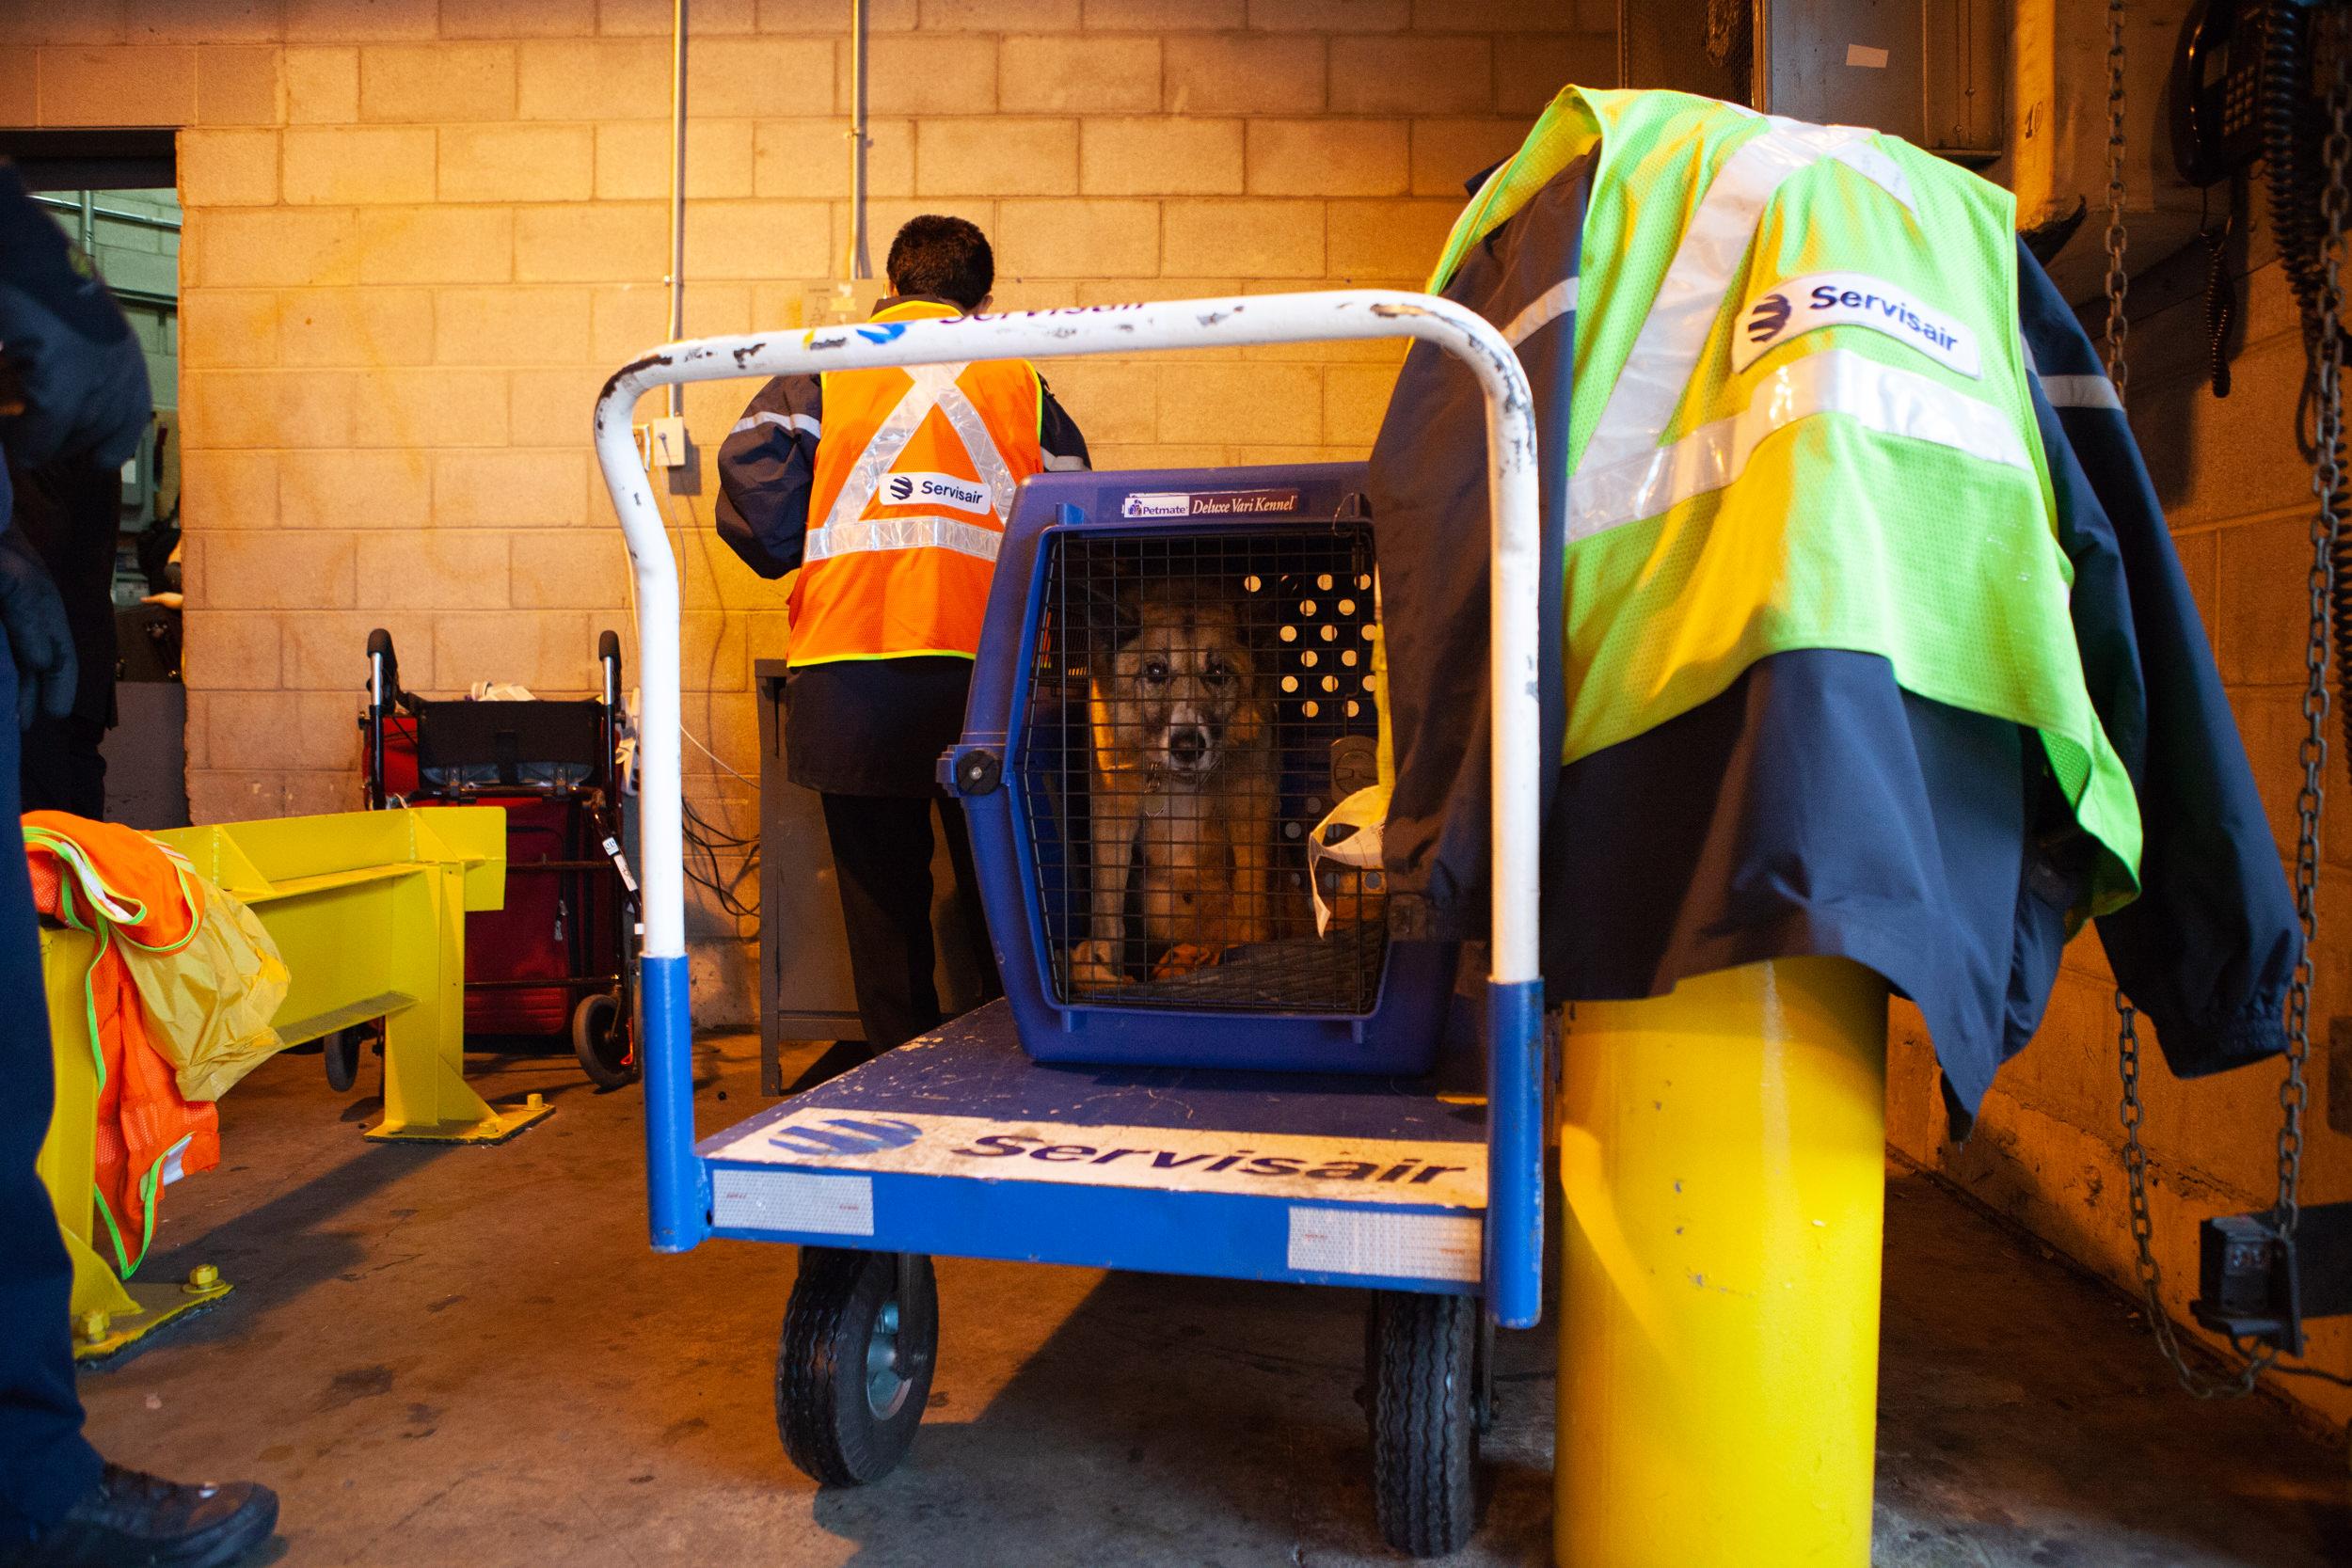 shlomi-amiga-dogs-in-cages-3.jpg